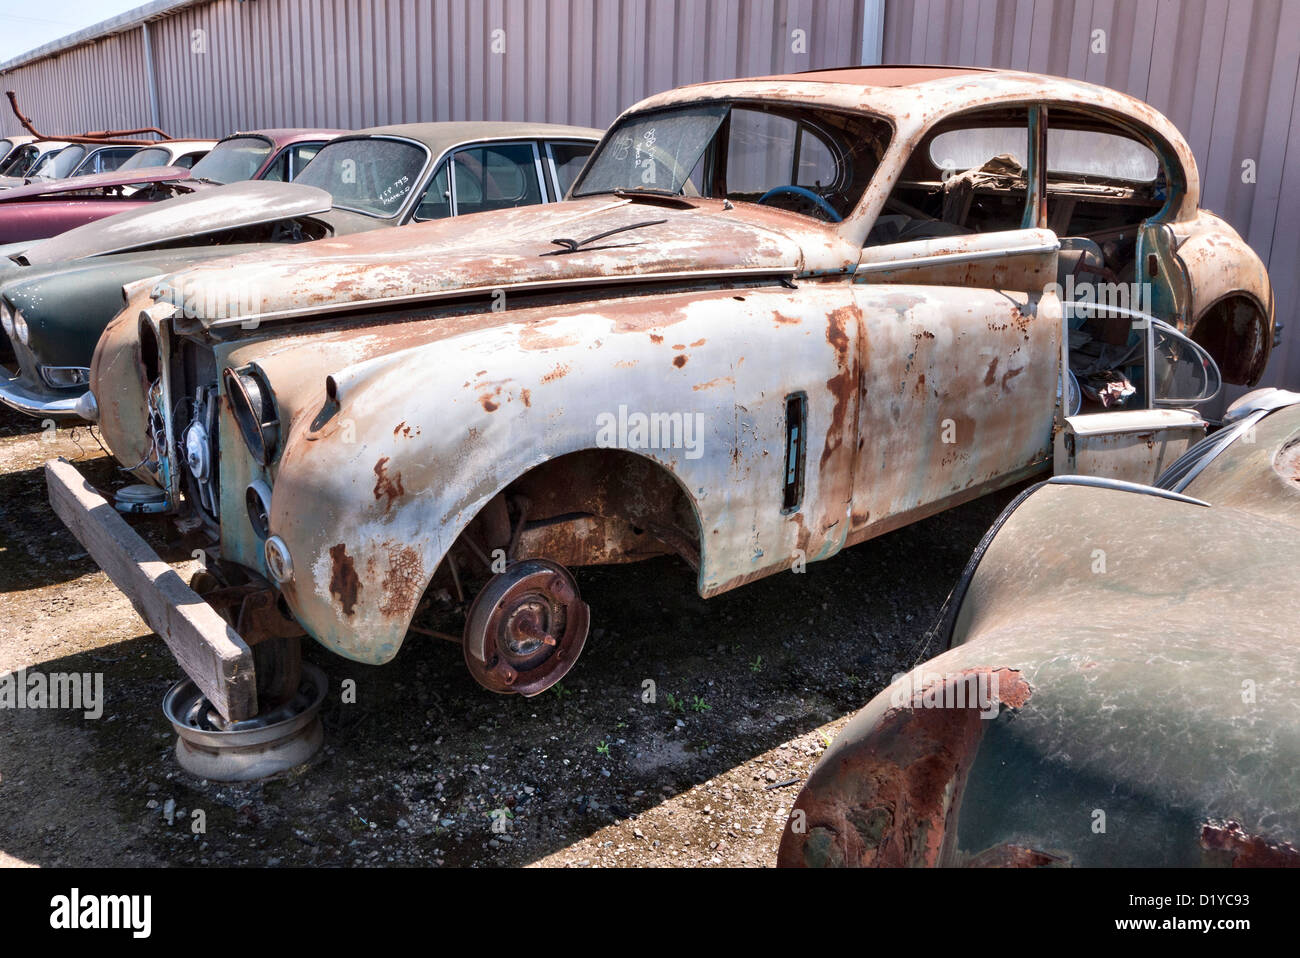 Jaguar recycling and junkyard in Stockton California USA - Stock Image